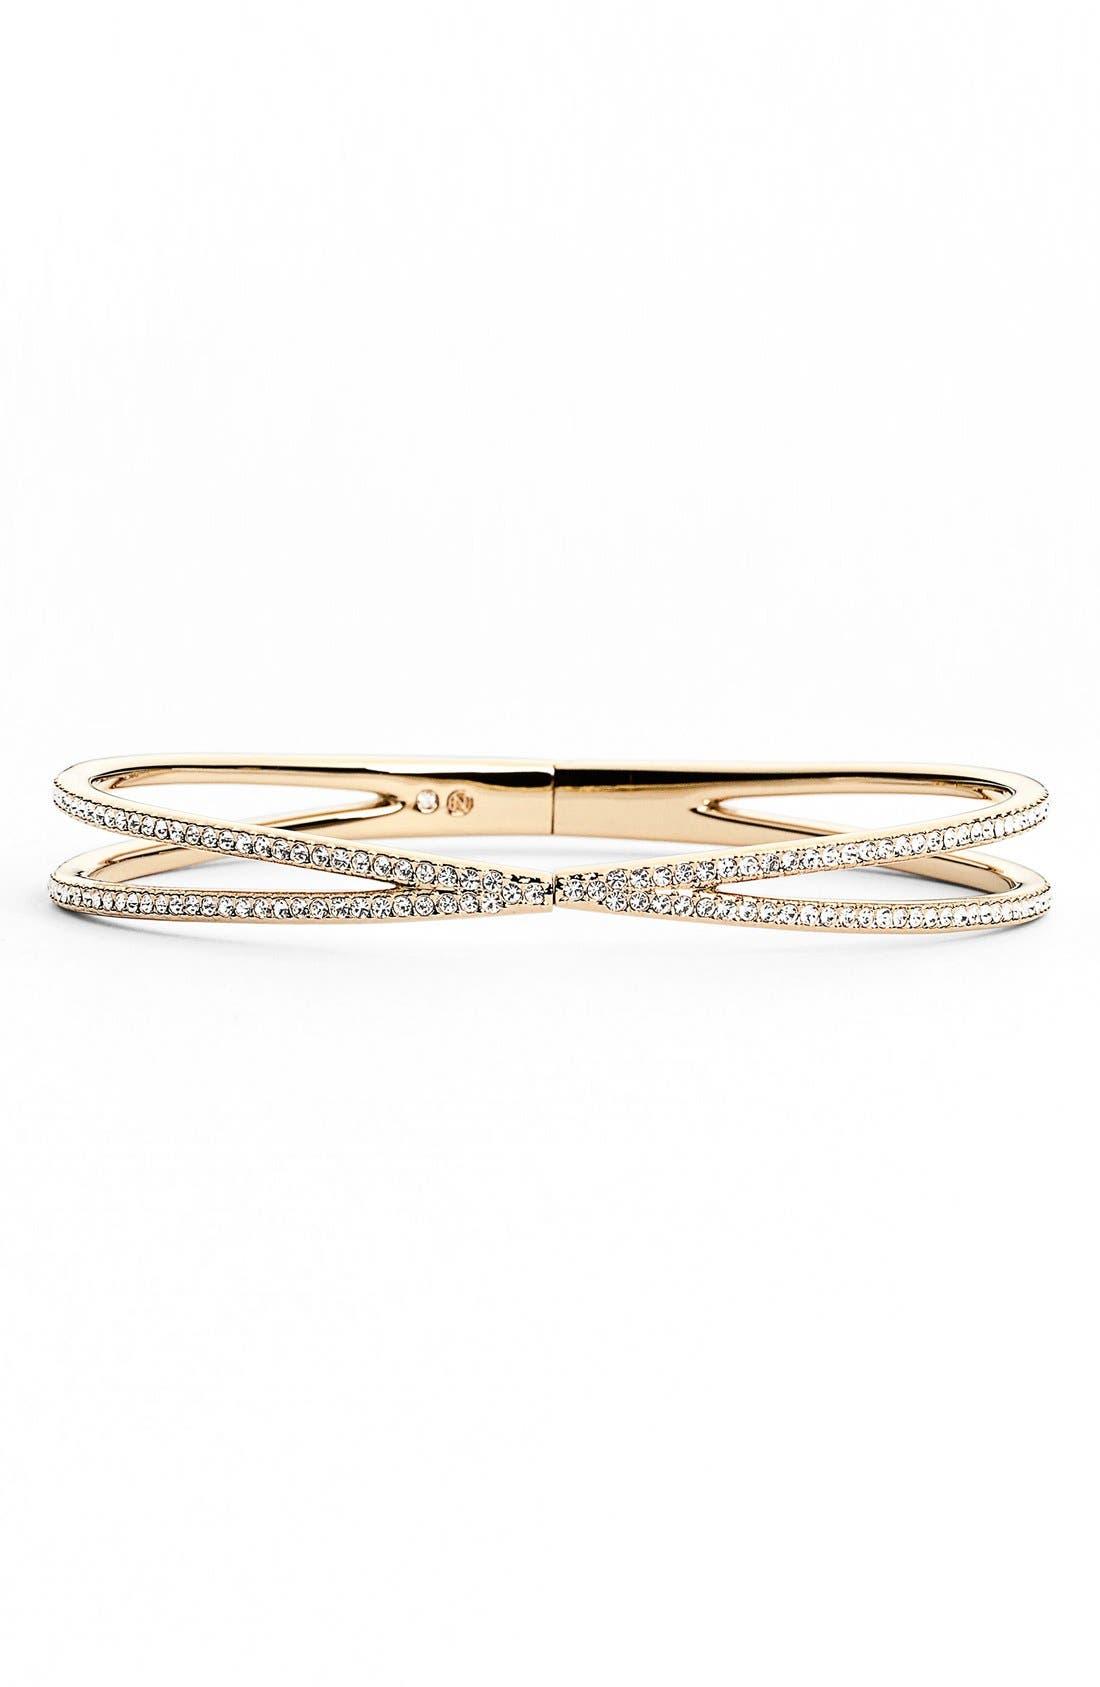 Alternate Image 1 Selected - Nadri Pavé Hinged Crossover Bracelet (Nordstrom Exclusive)